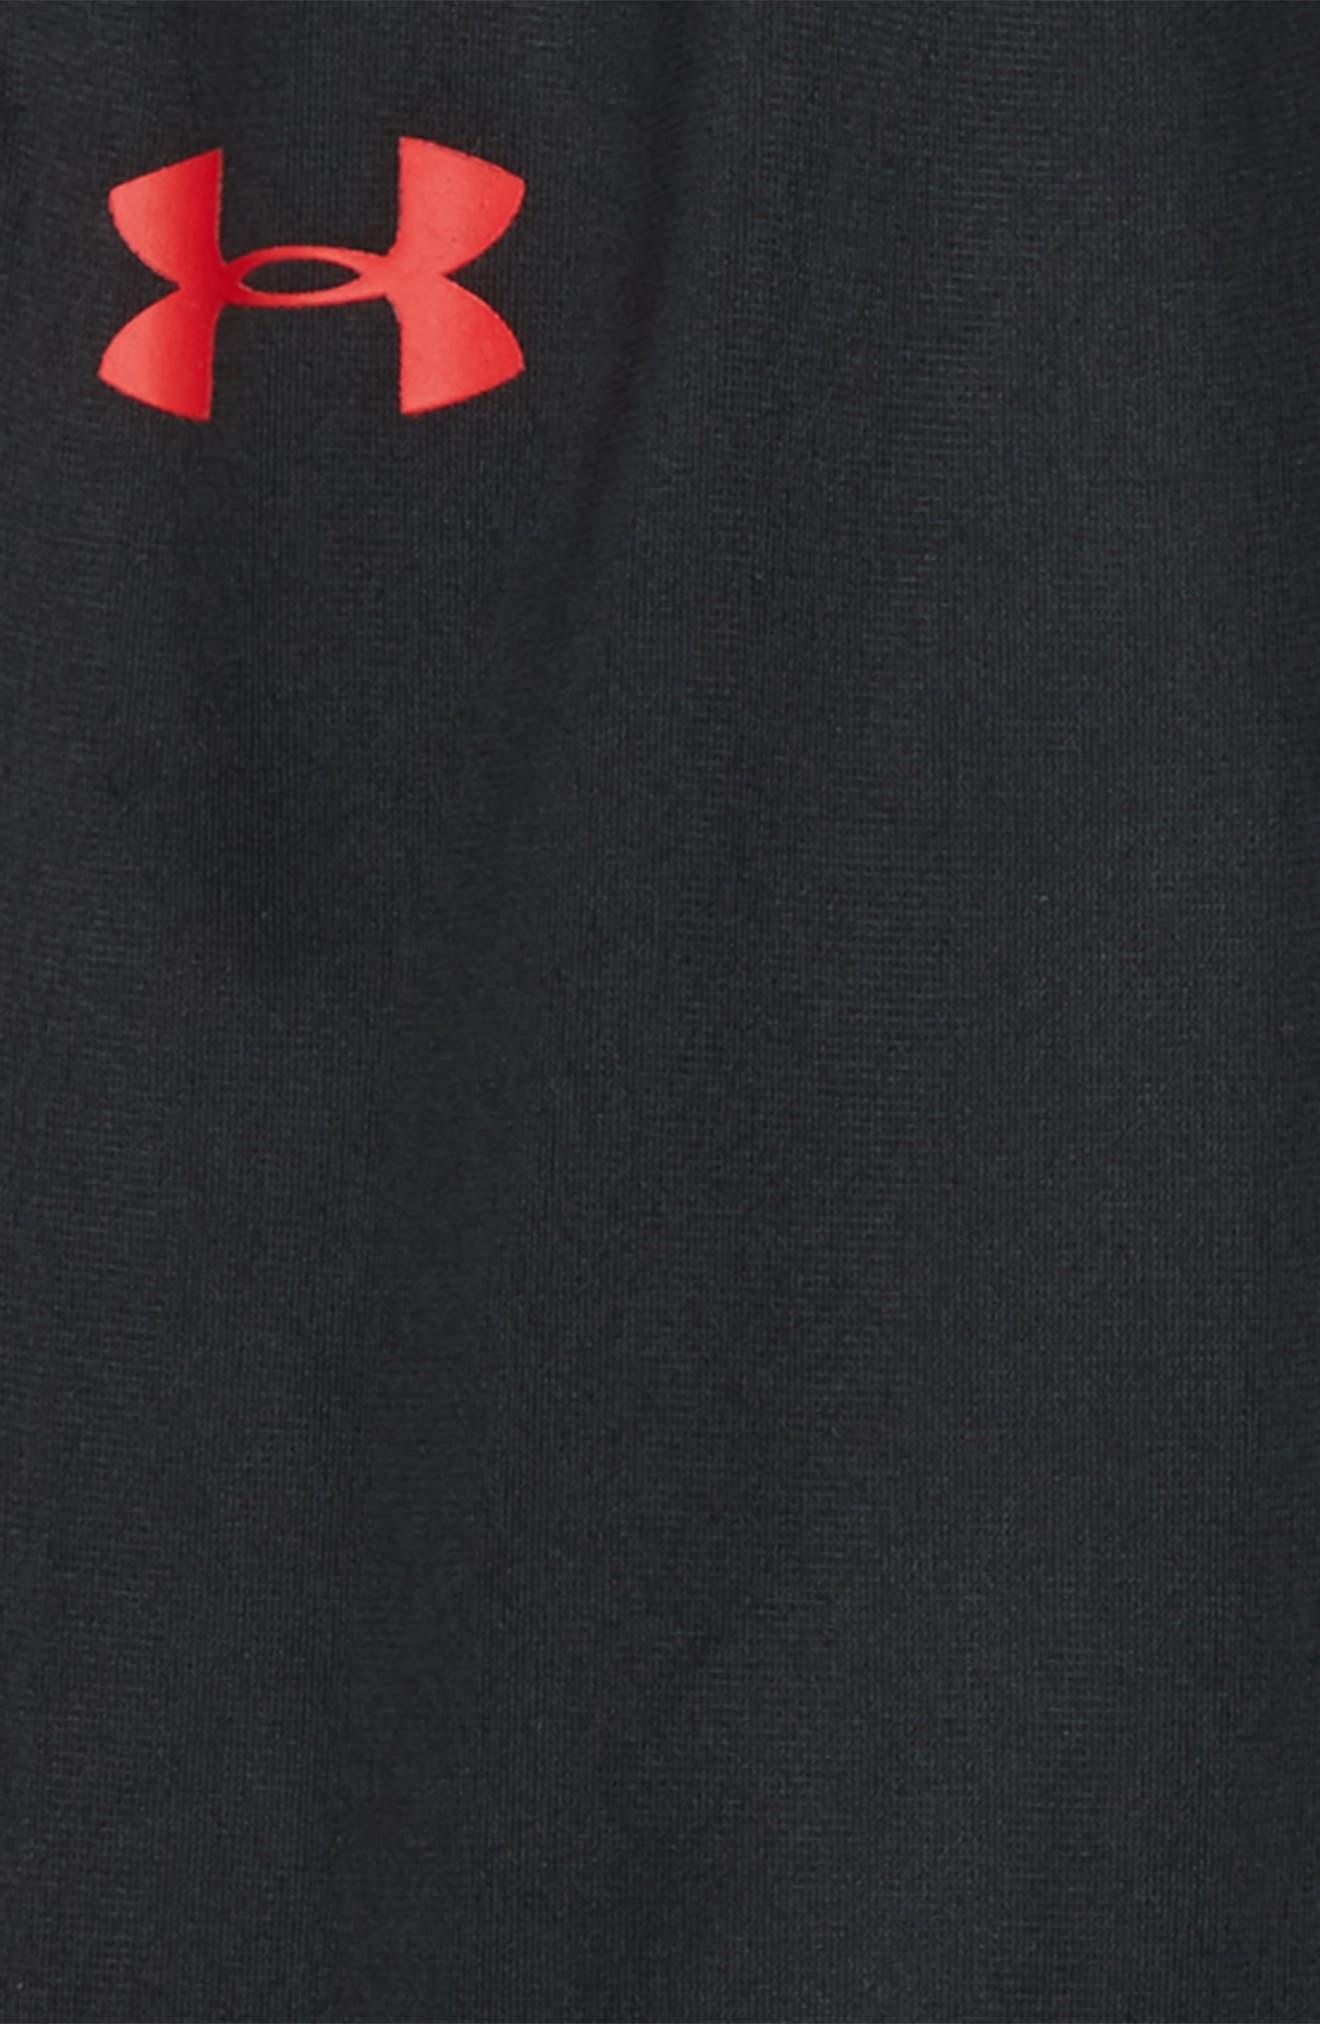 Brawler 2.0 Sweatpants,                             Alternate thumbnail 3, color,                             001